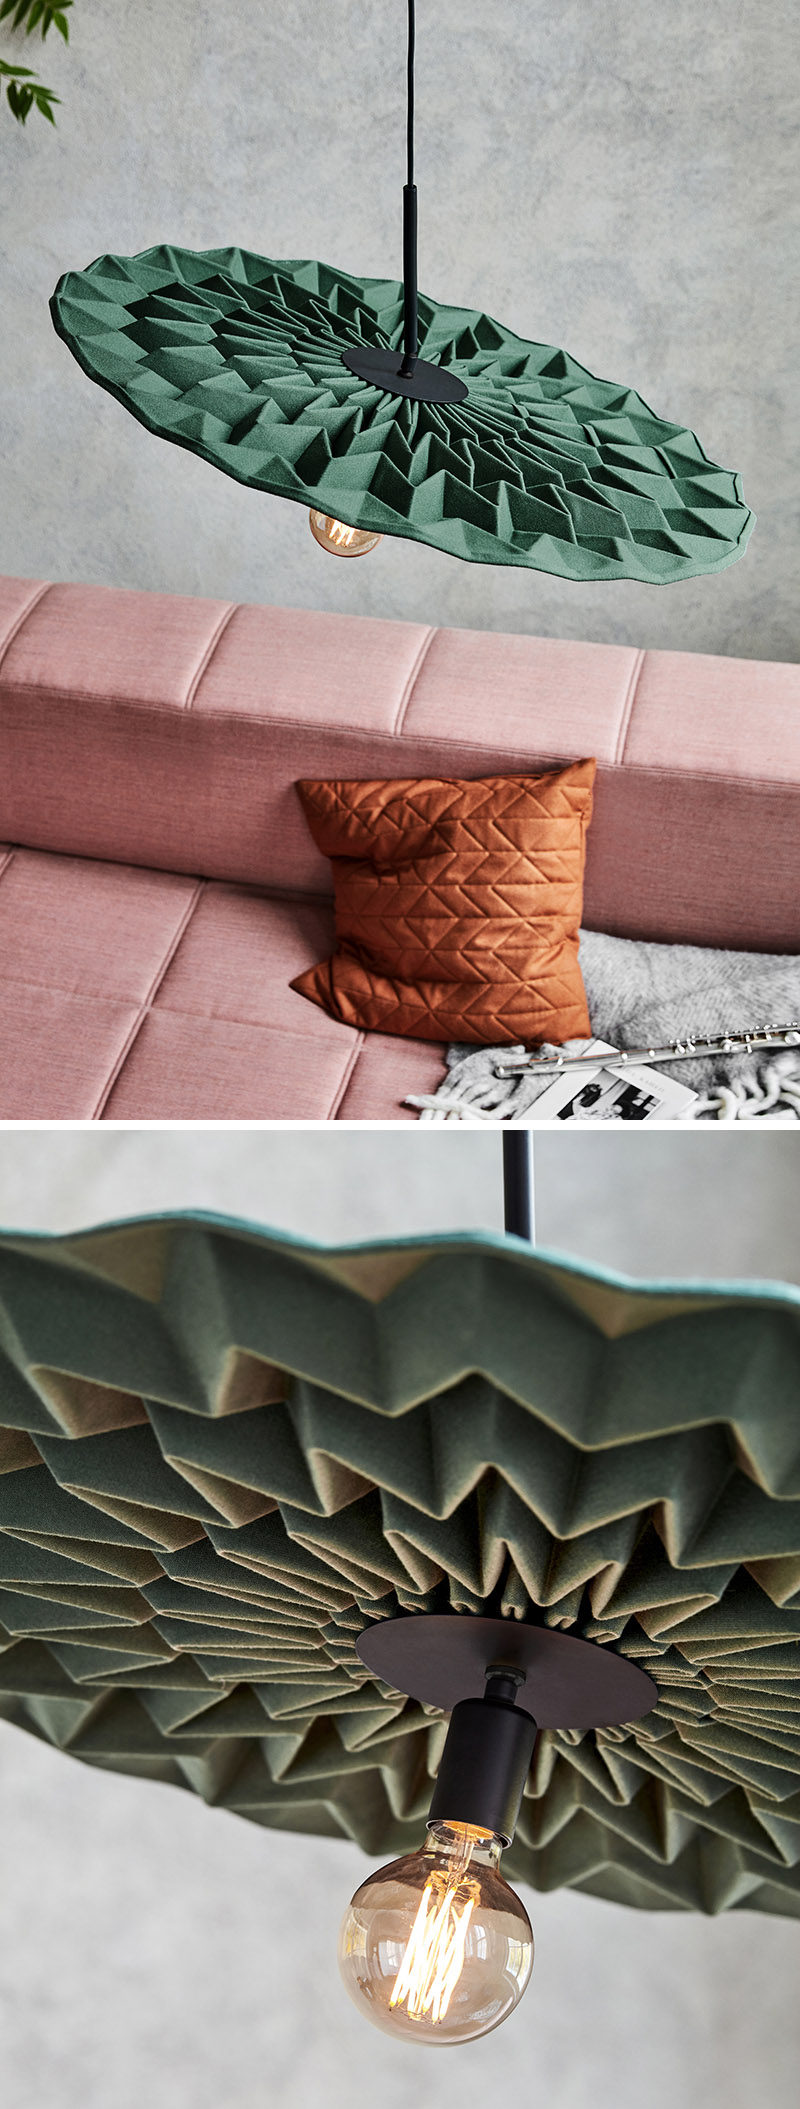 Kyla McCallum has designed 'Fold', a modern pendant light whose design has been inspired by the crisp folds of origami. #ModernLighting #PendantLight #Design